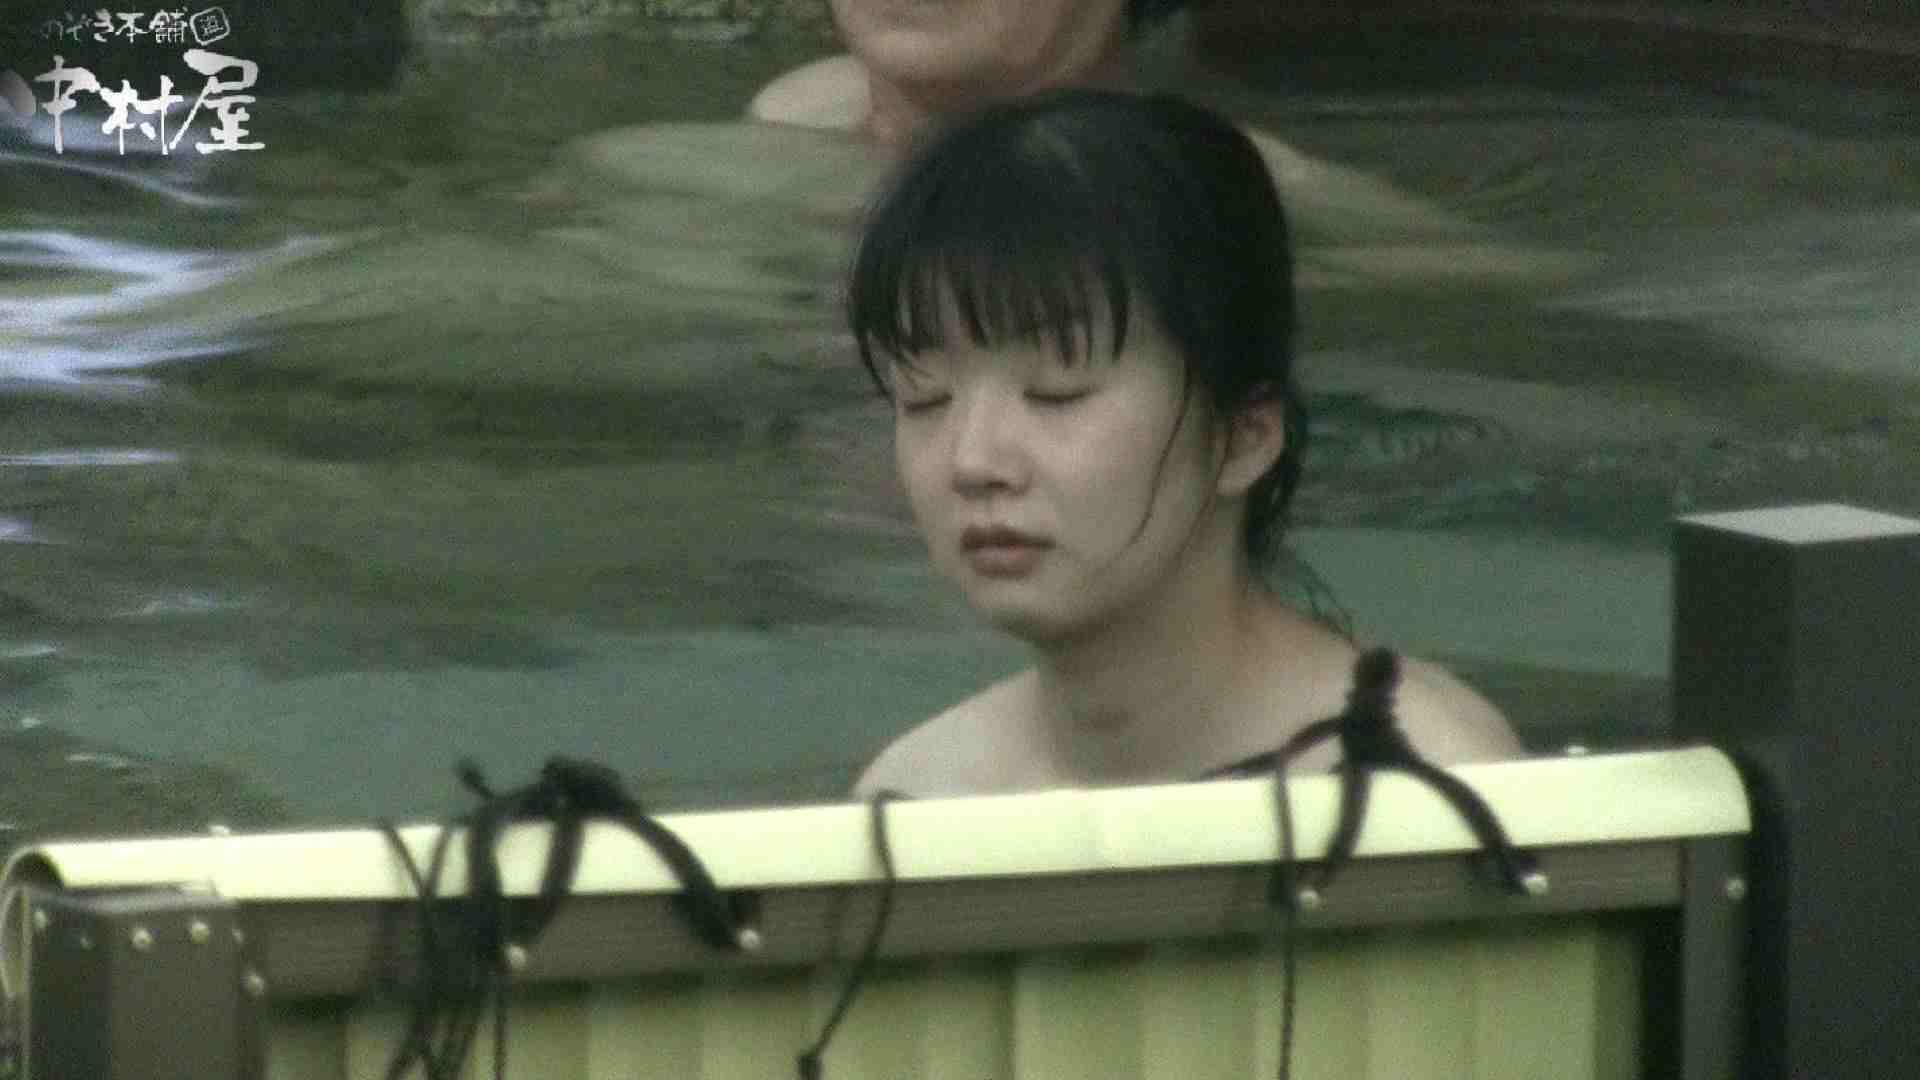 Aquaな露天風呂Vol.904 OL  60連発 11